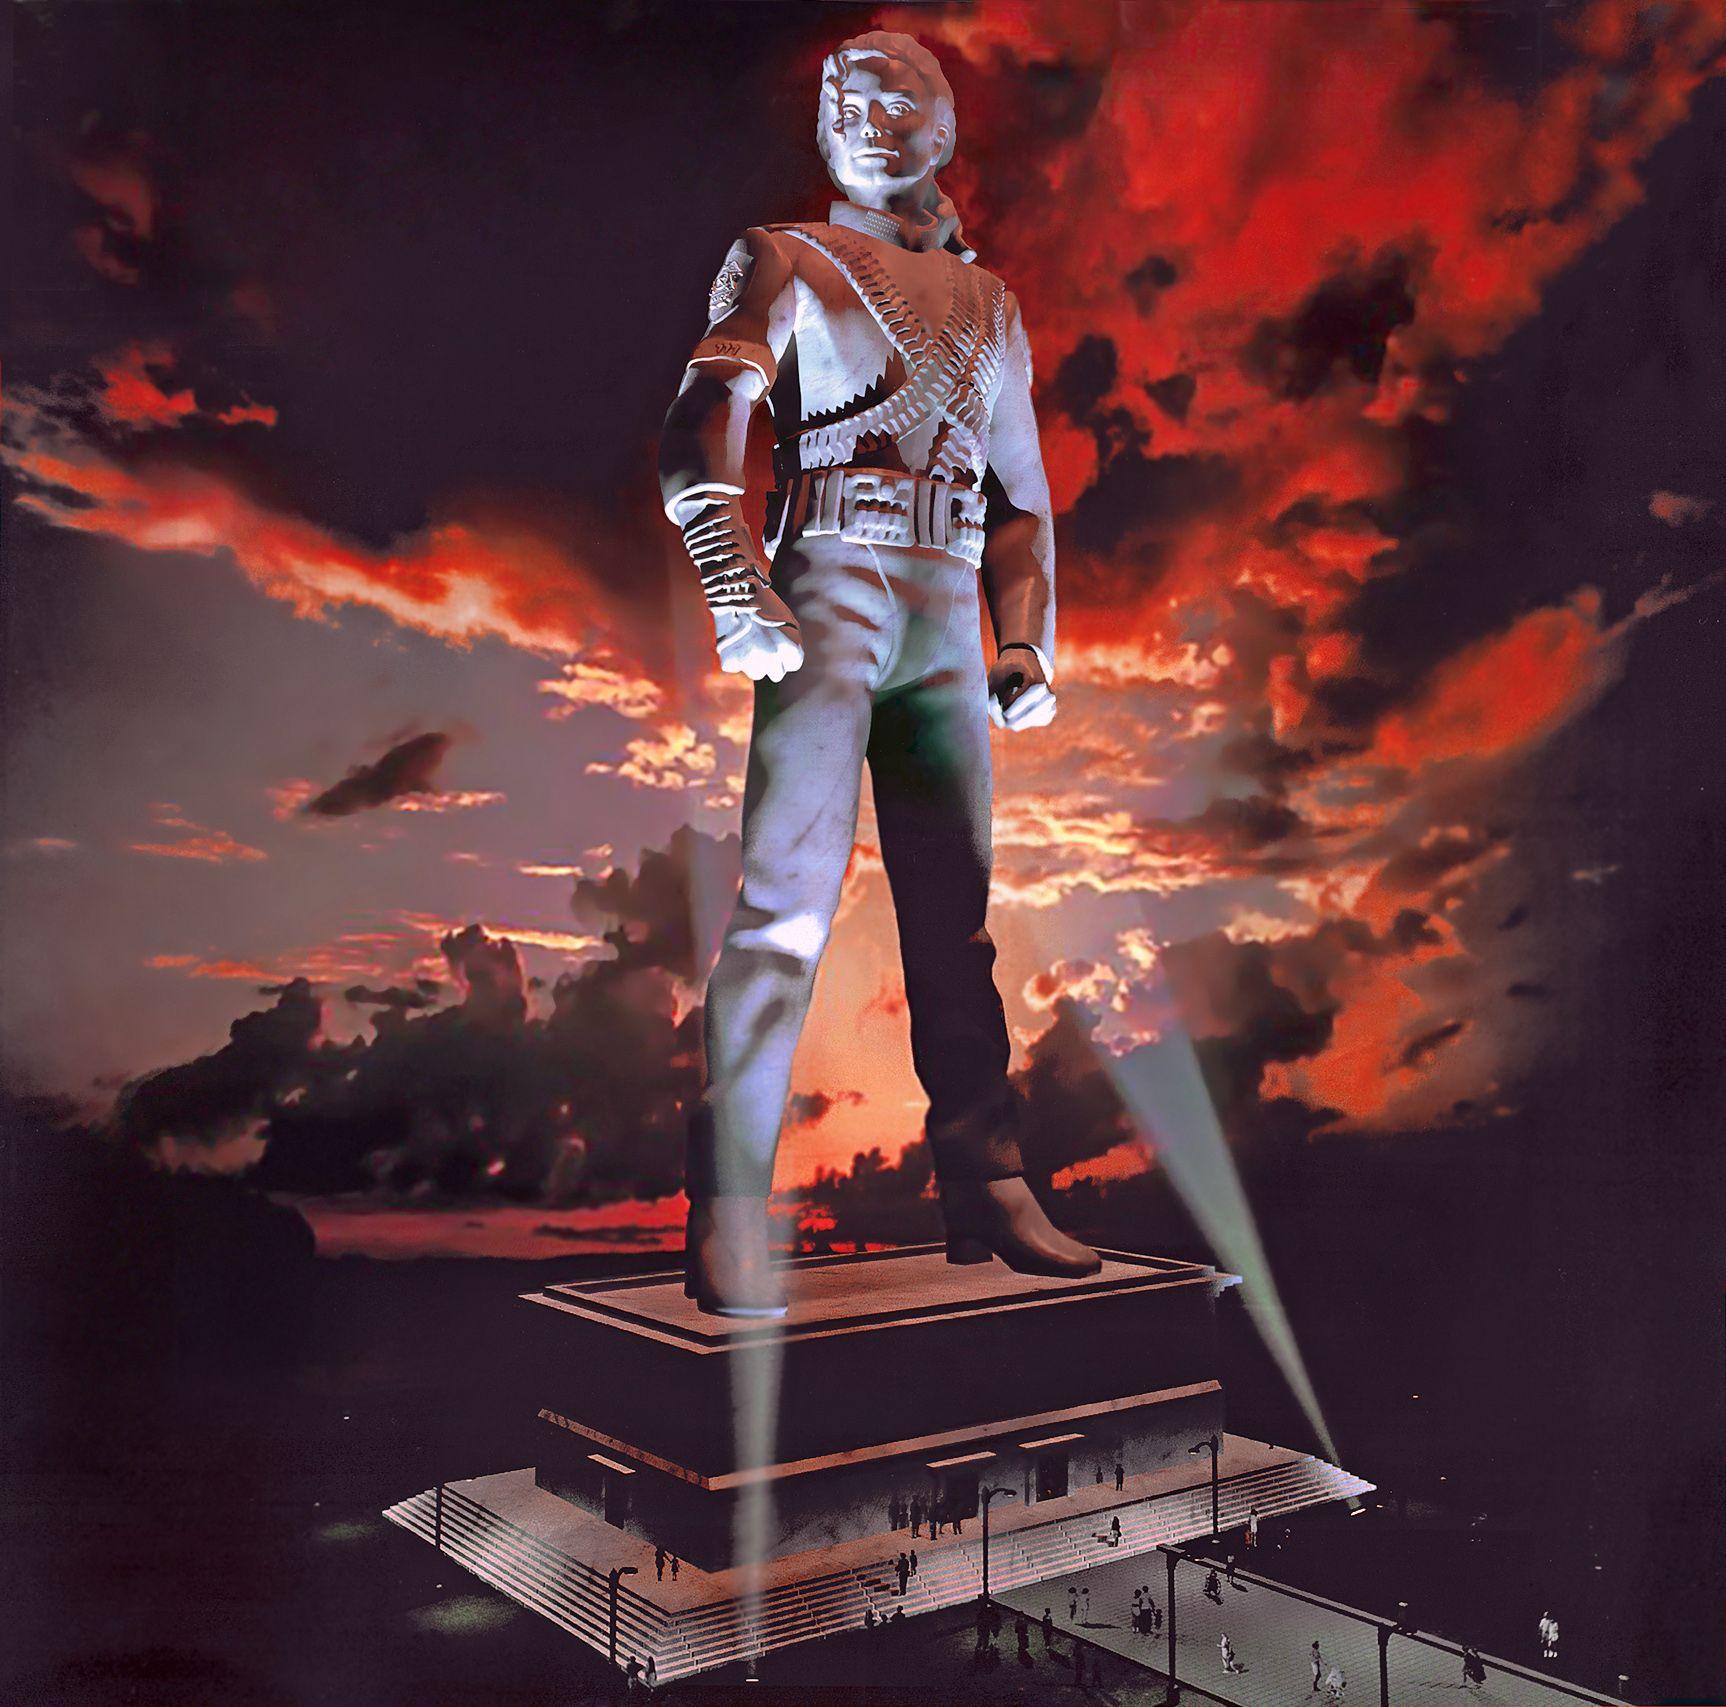 Michael Jackson Aesthetic Music